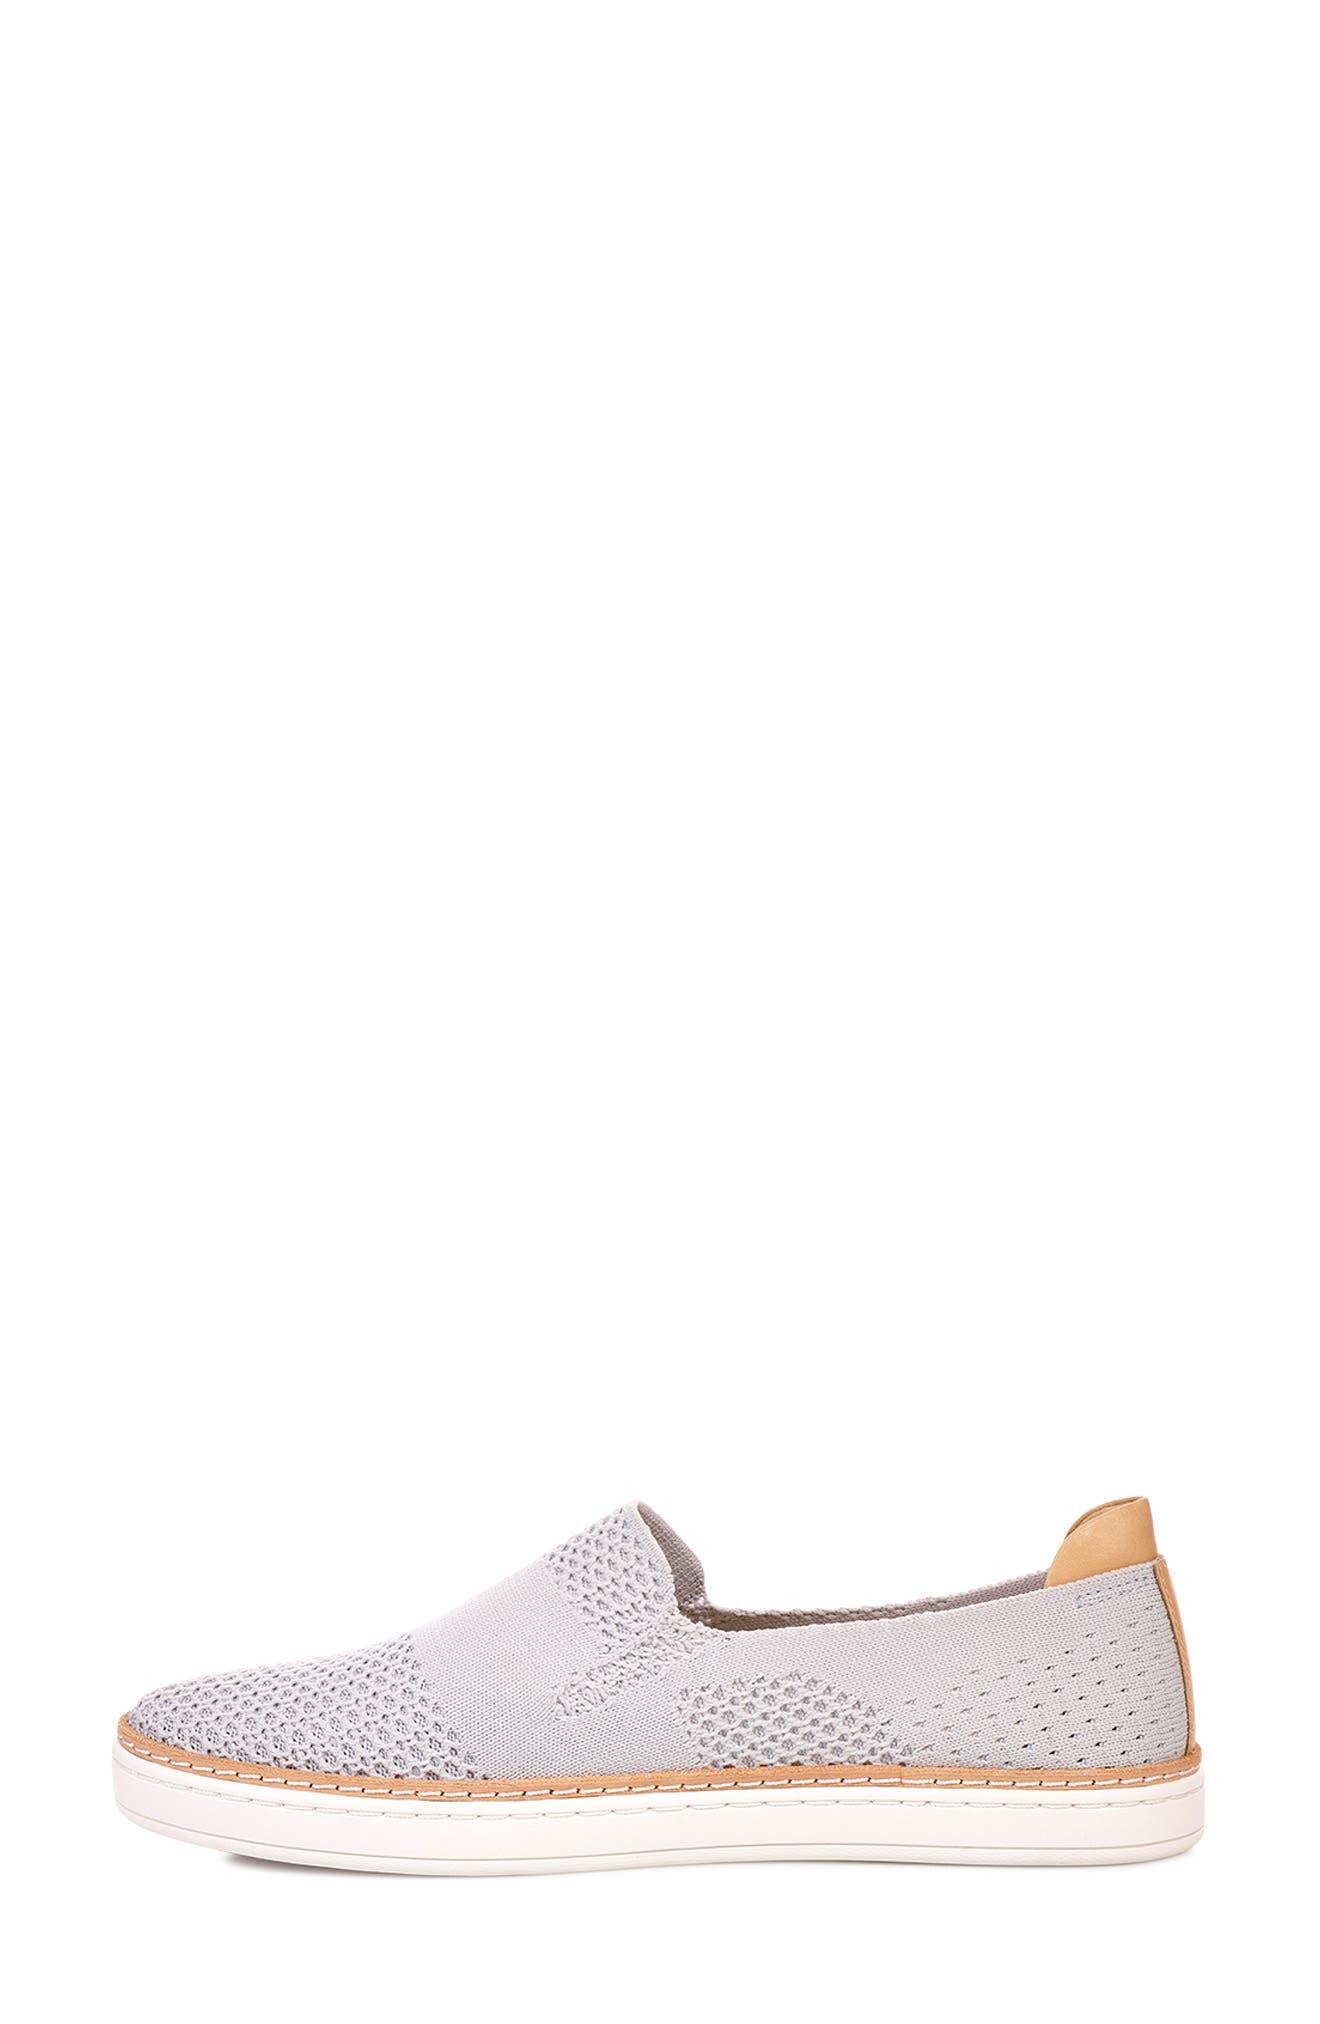 Sammy Sneaker,                             Alternate thumbnail 6, color,                             GREY VIOLET FABRIC